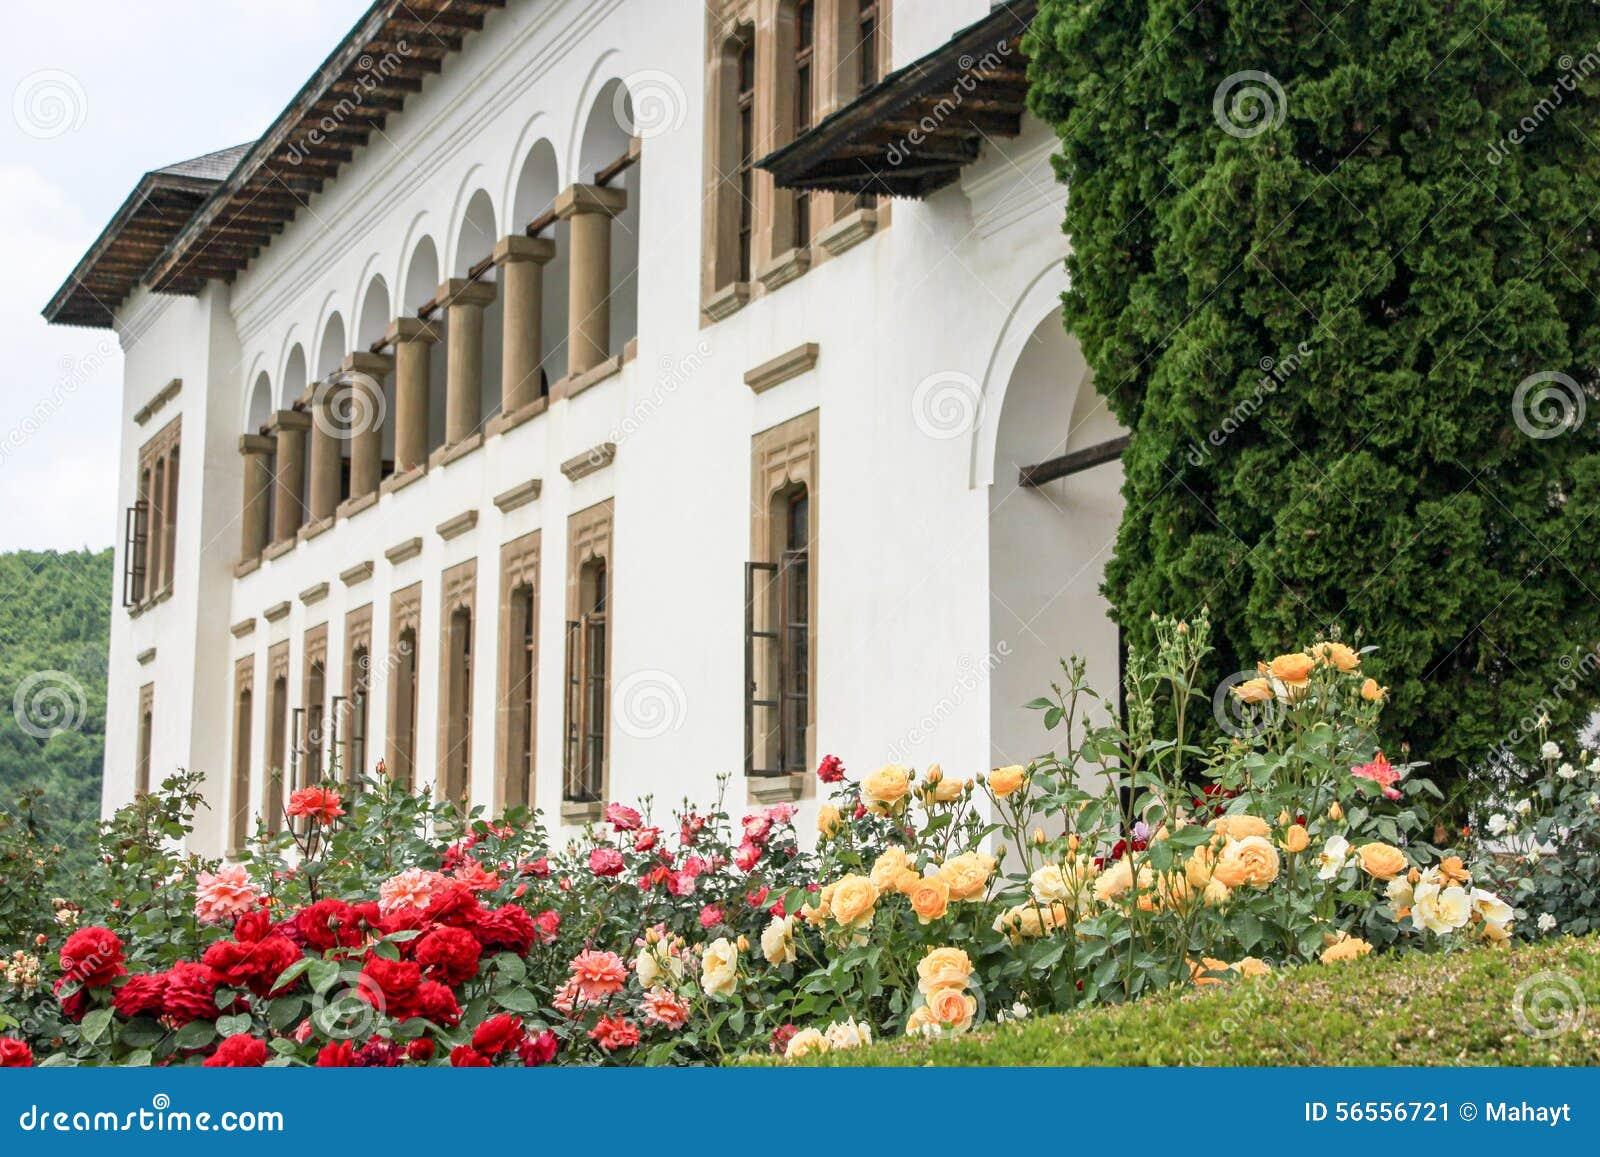 Download Αγροτικό τοπίο με το παλαιό μοναστήρι στη Ρουμανία Στοκ Εικόνα - εικόνα από θόλος, βακκινίων: 56556721